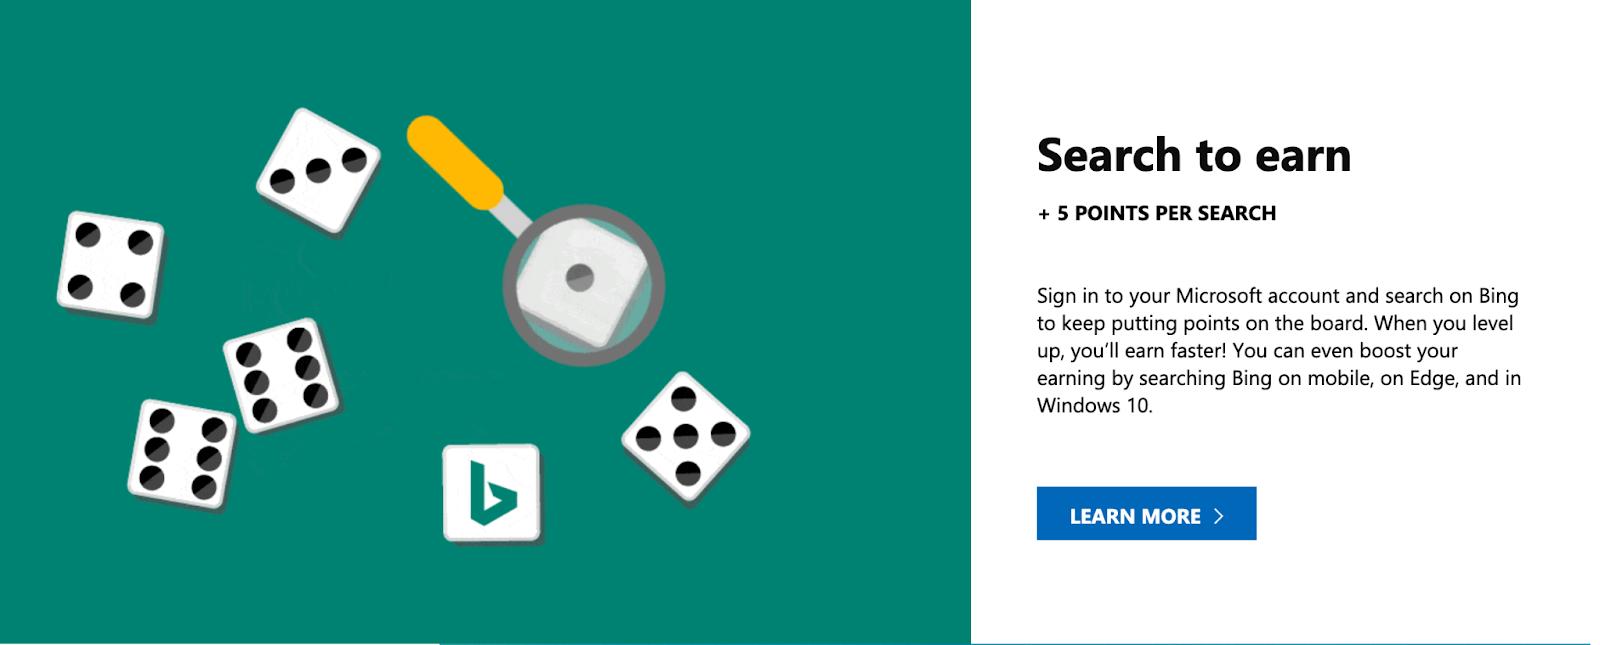 Bing Search to earn